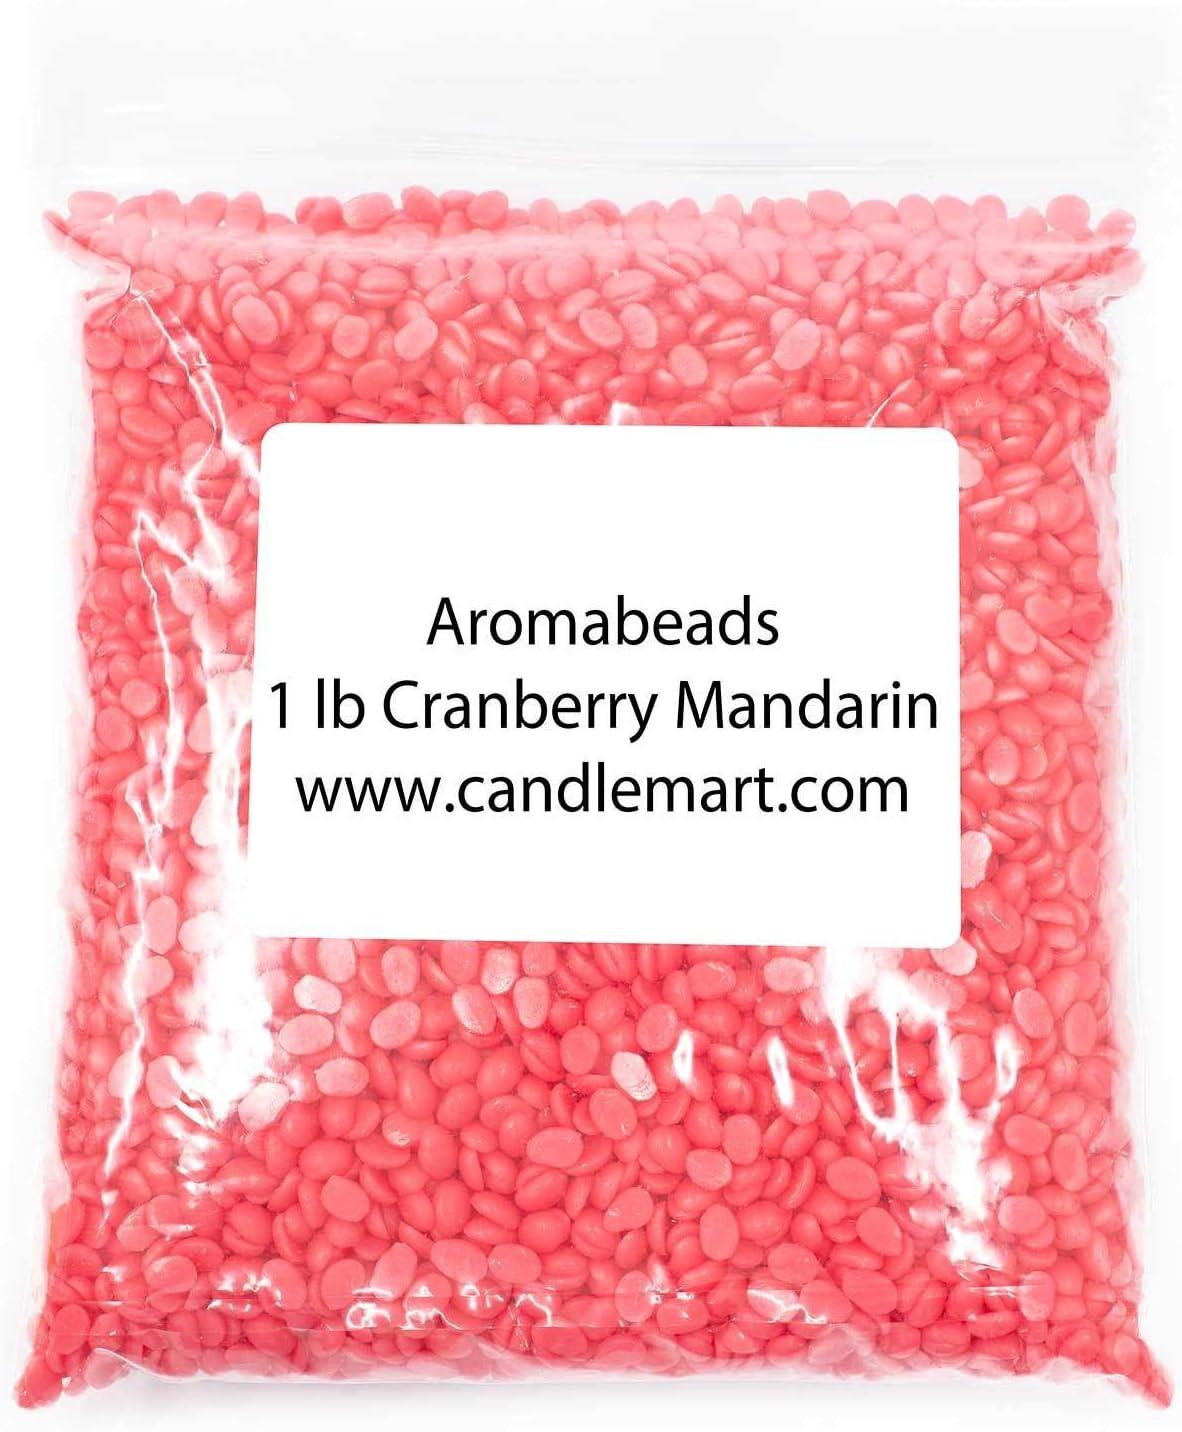 Aromabeads Singles Cranberry Mandarin Bulk Wax Melts